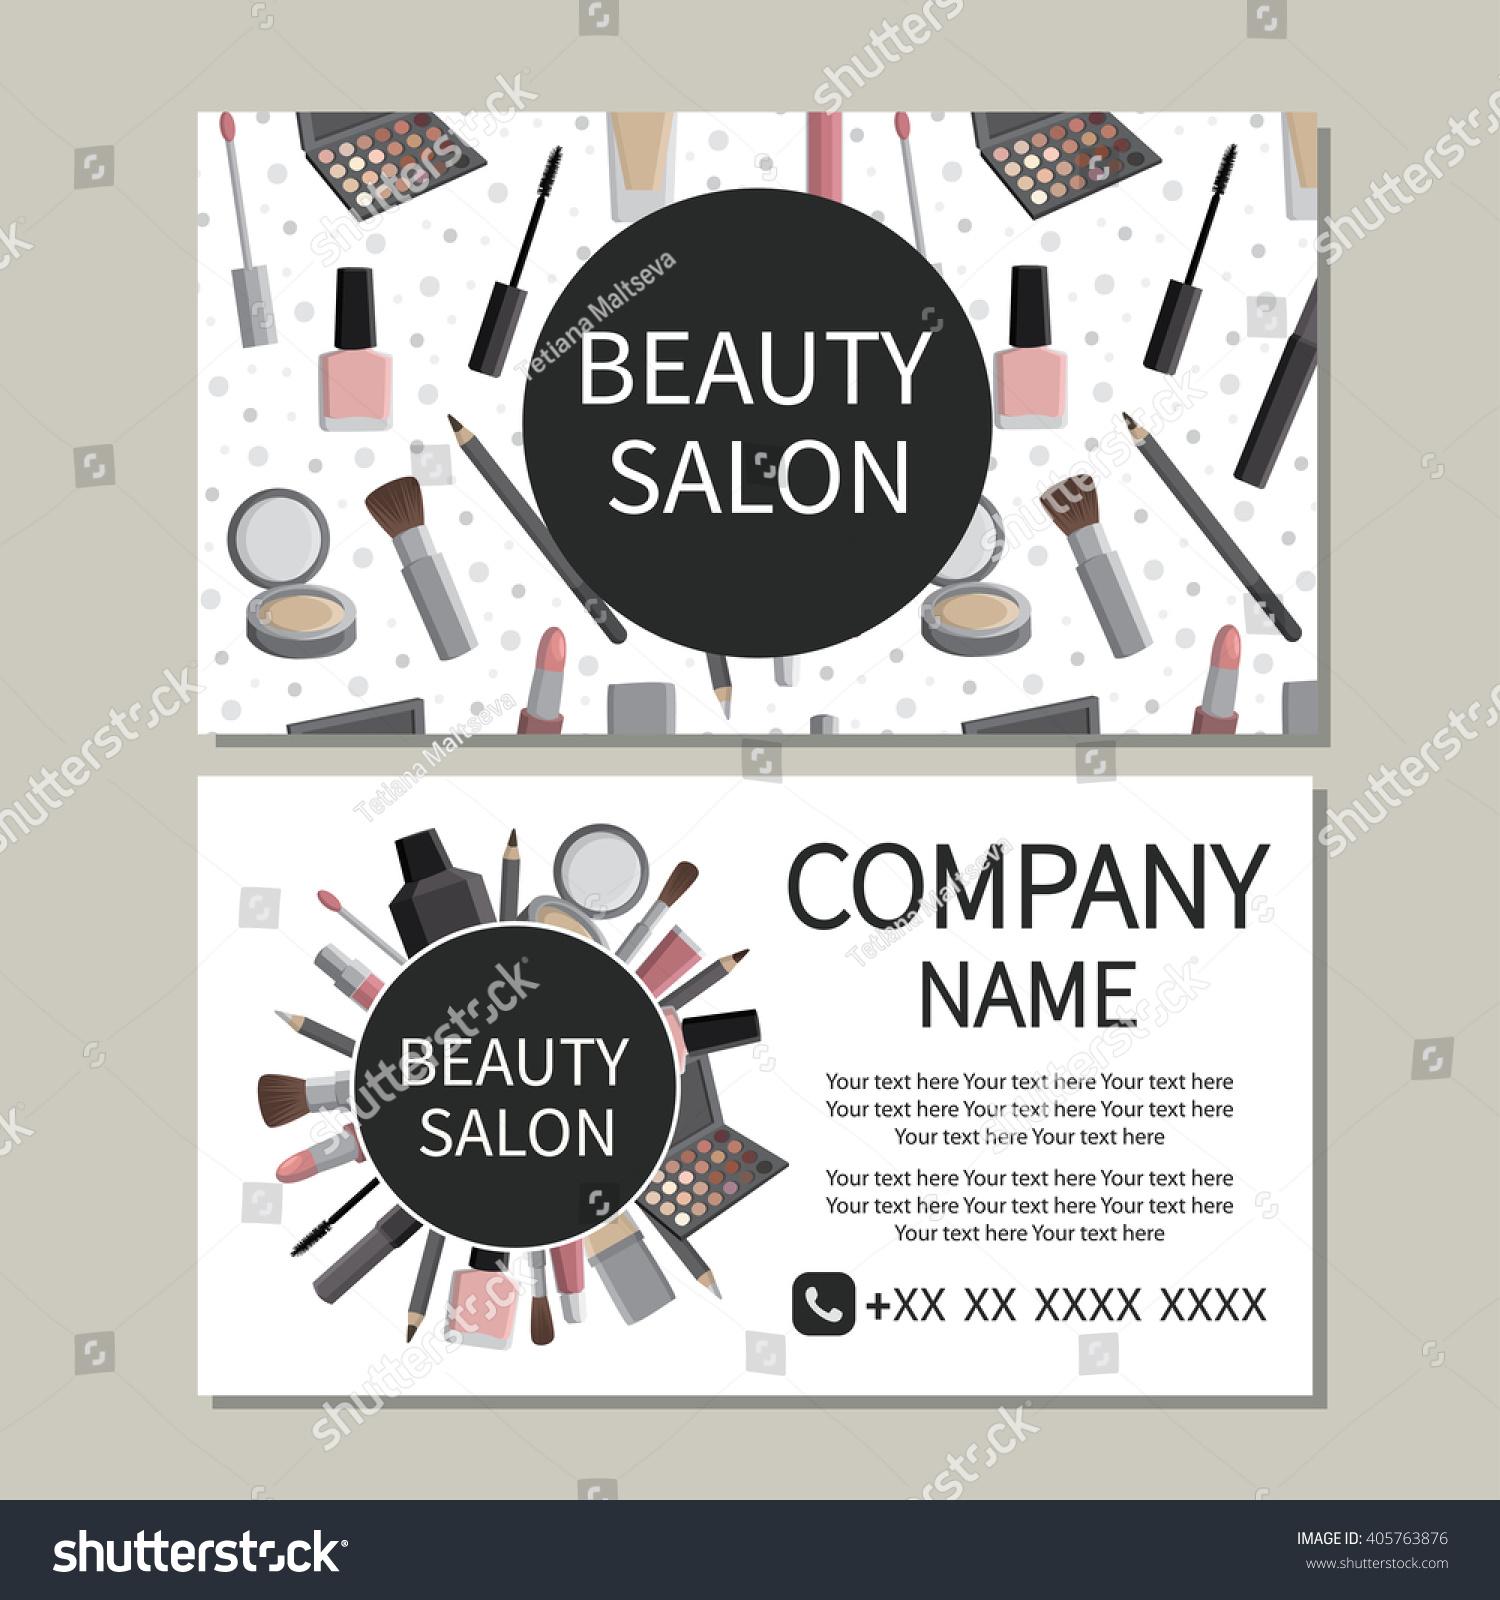 Beauty salon beauty makeup care cute design of for A trial beauty treatment salon